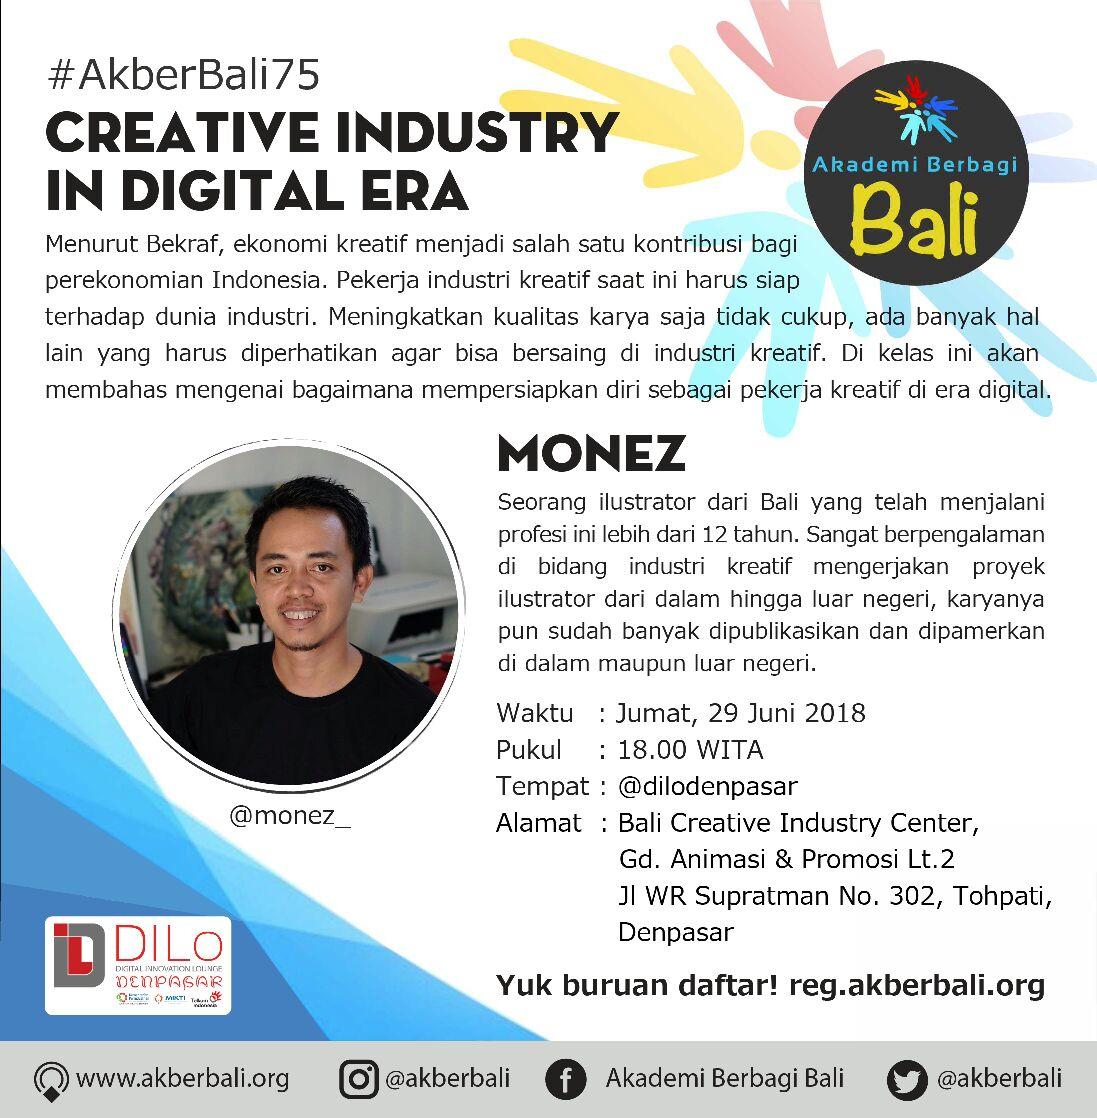 Bali : Creative Industry in Digital Era